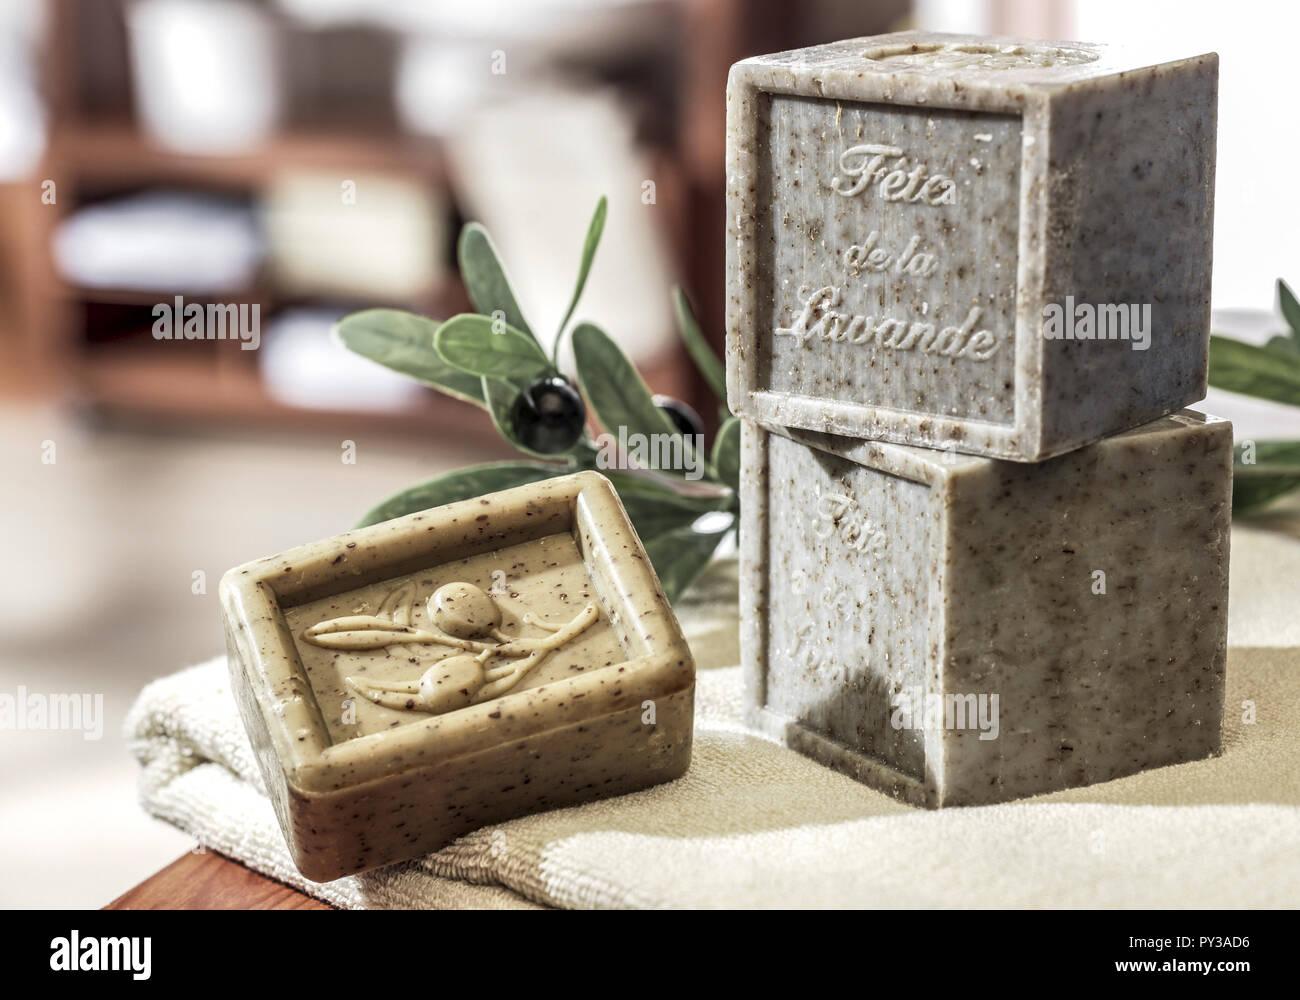 Seifenstuecke mit Olivenoel Stock Photo